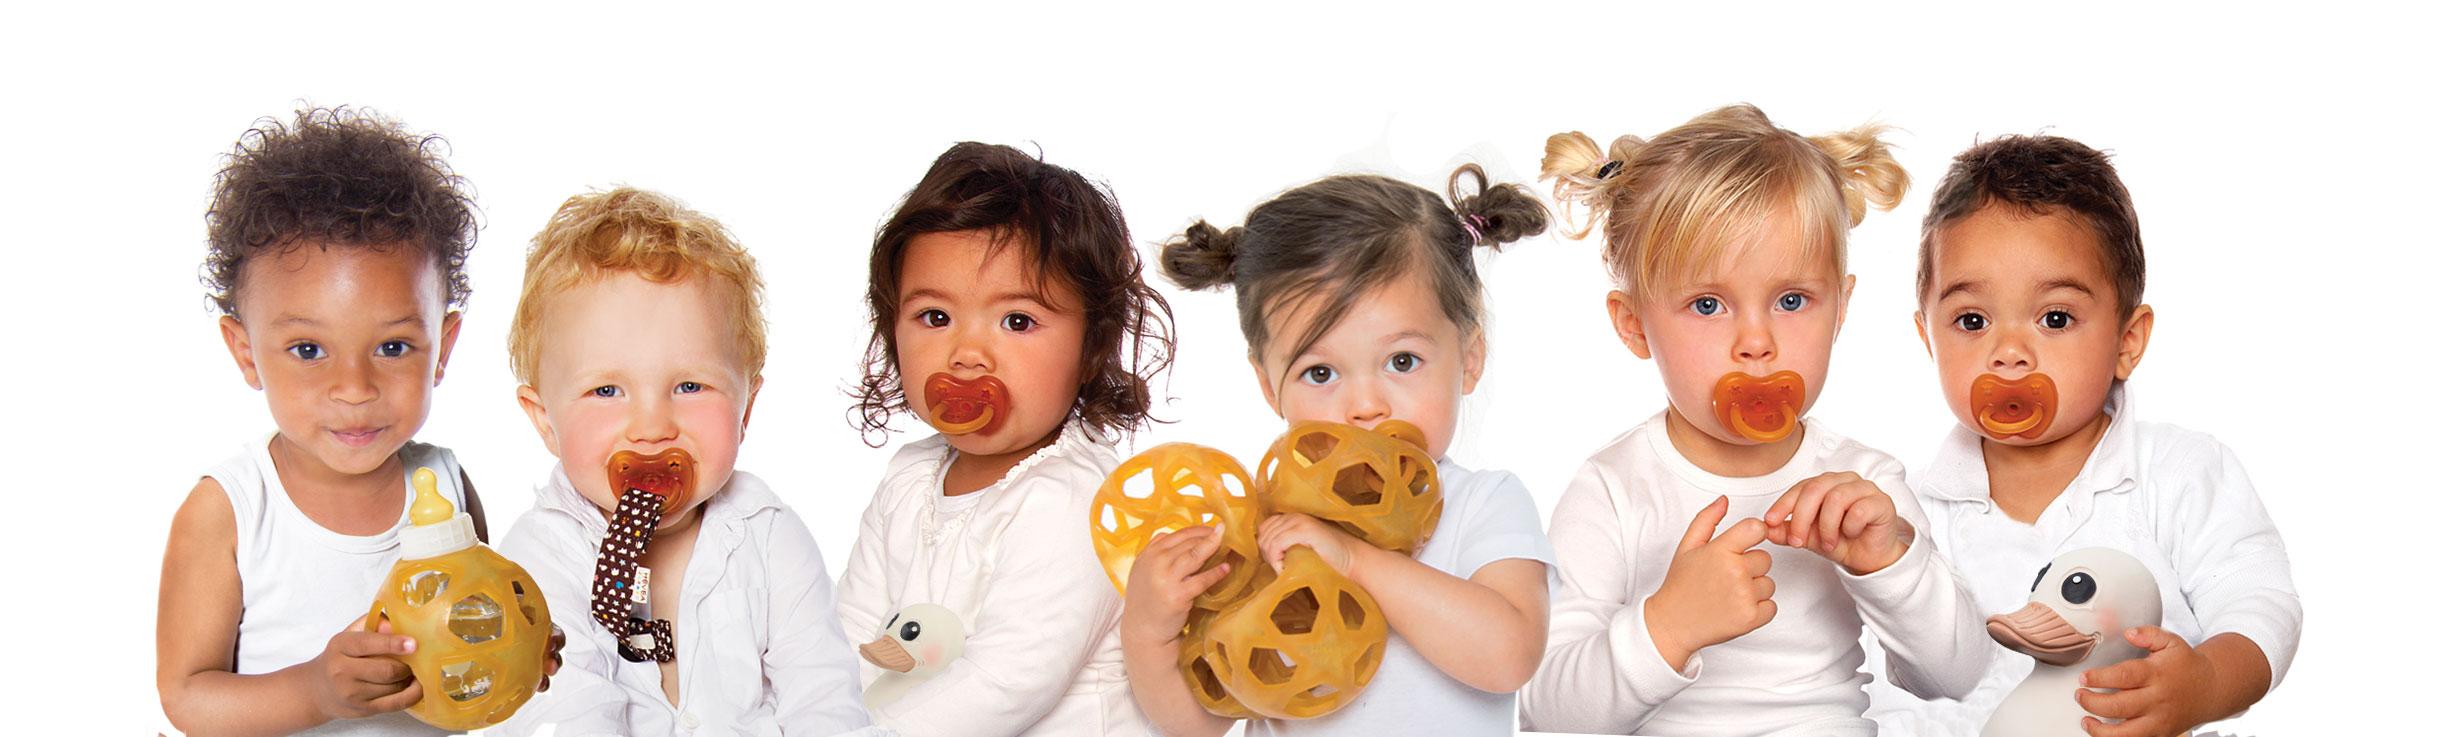 HEVEA-6-children-w-products NEW.jpg